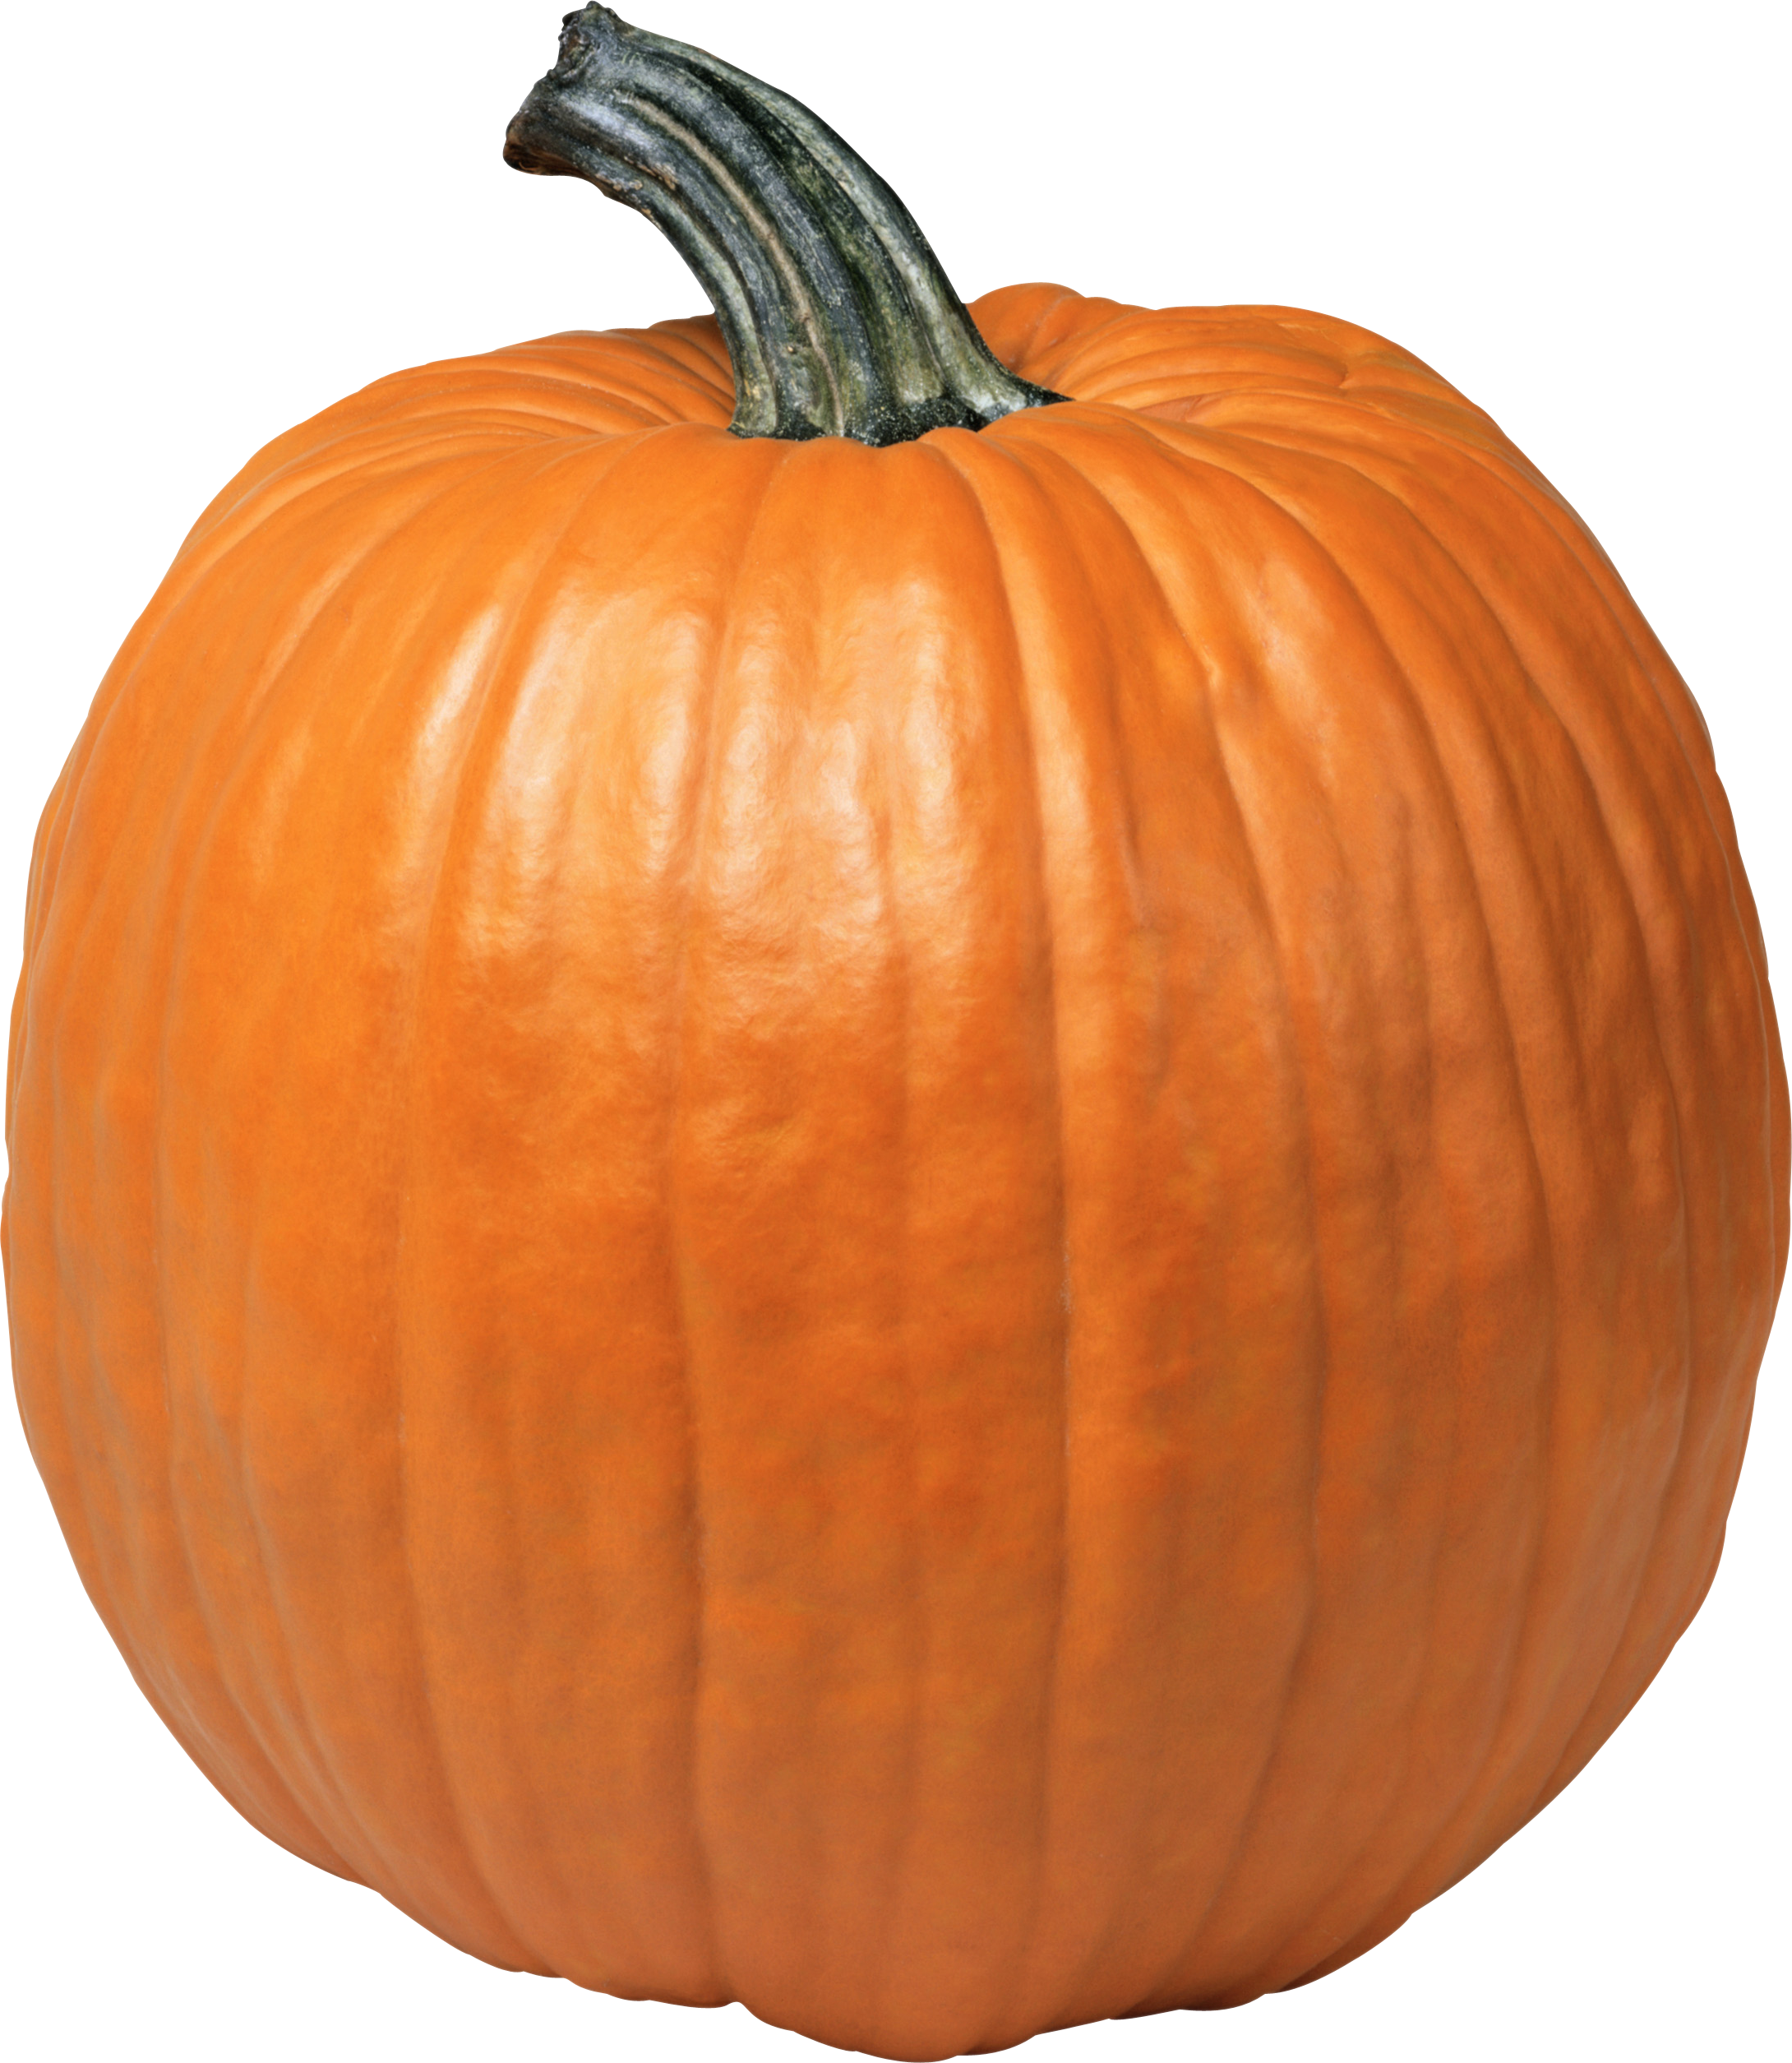 Pumpkin PNG - 27274